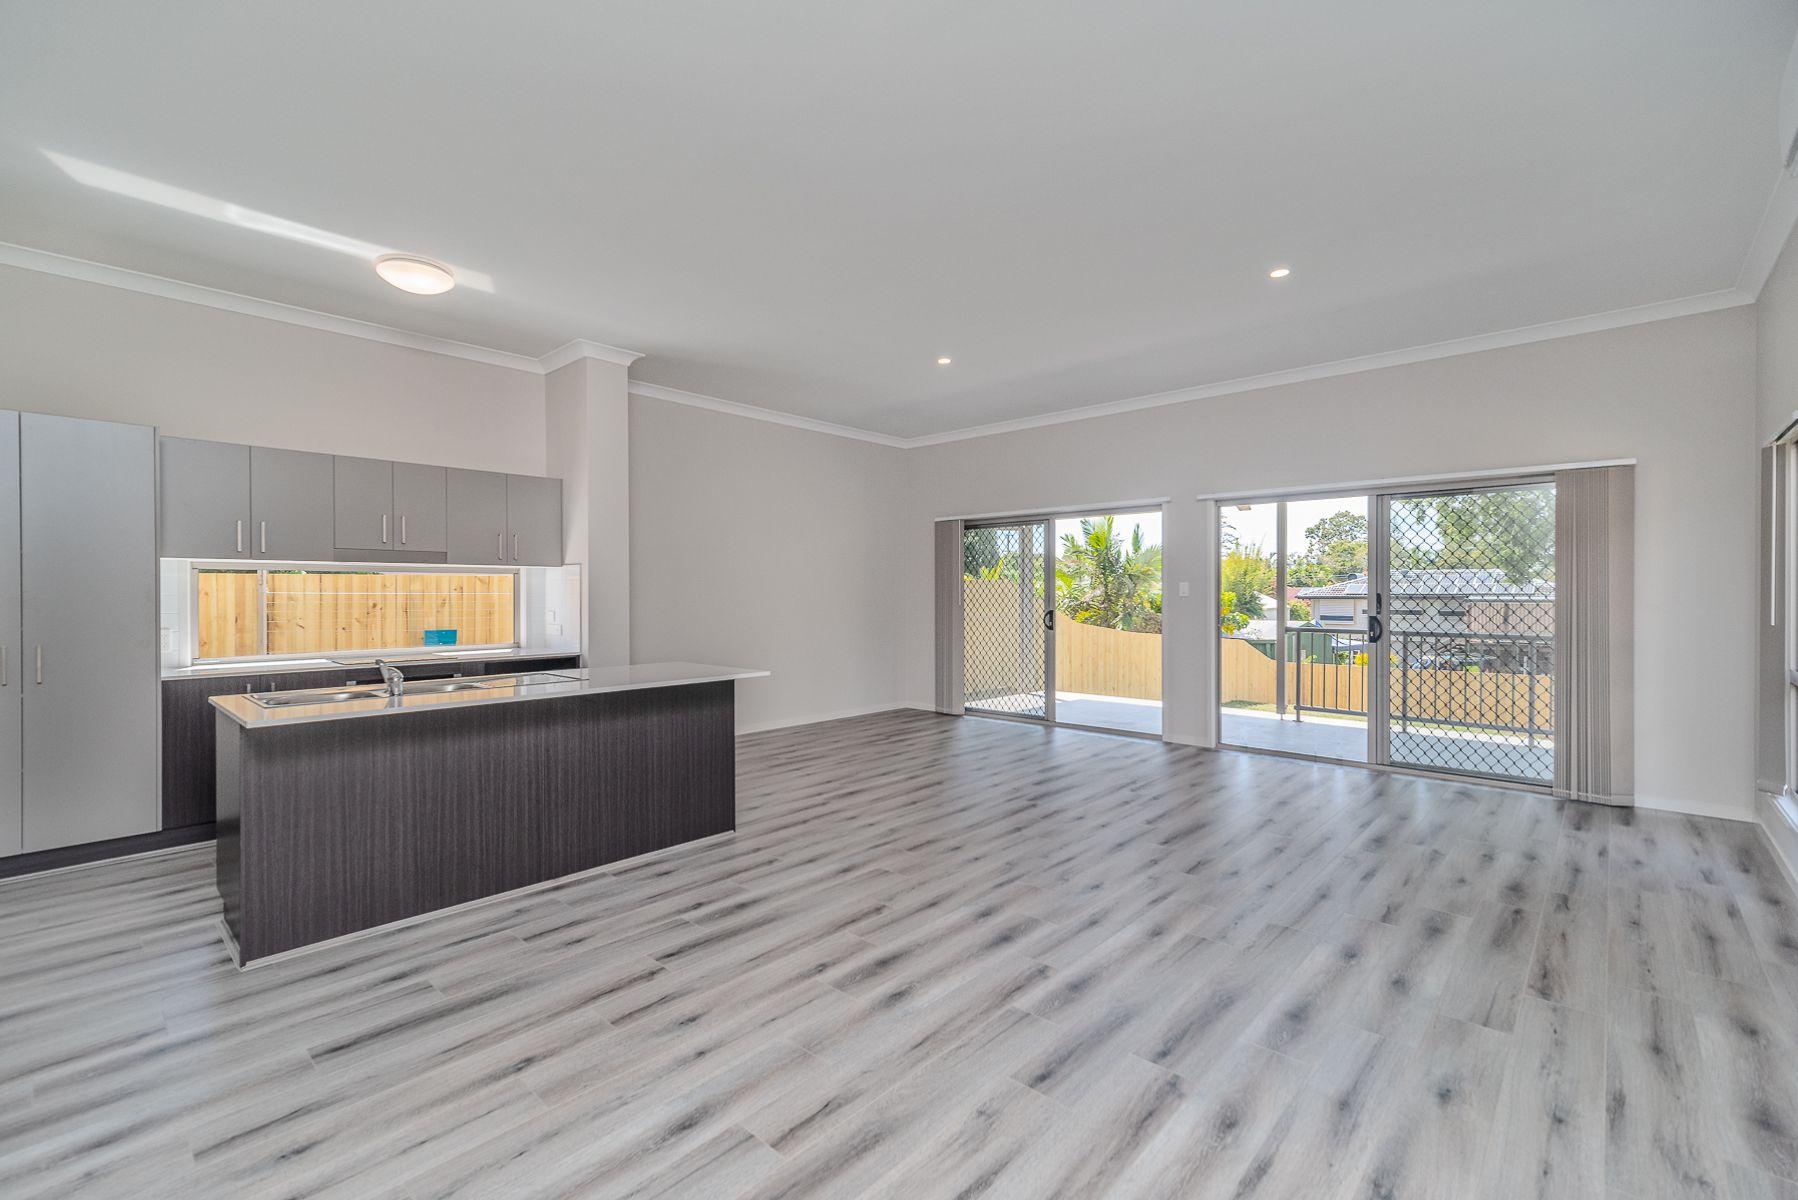 148 Kamarin Street, Manly West, QLD 4179